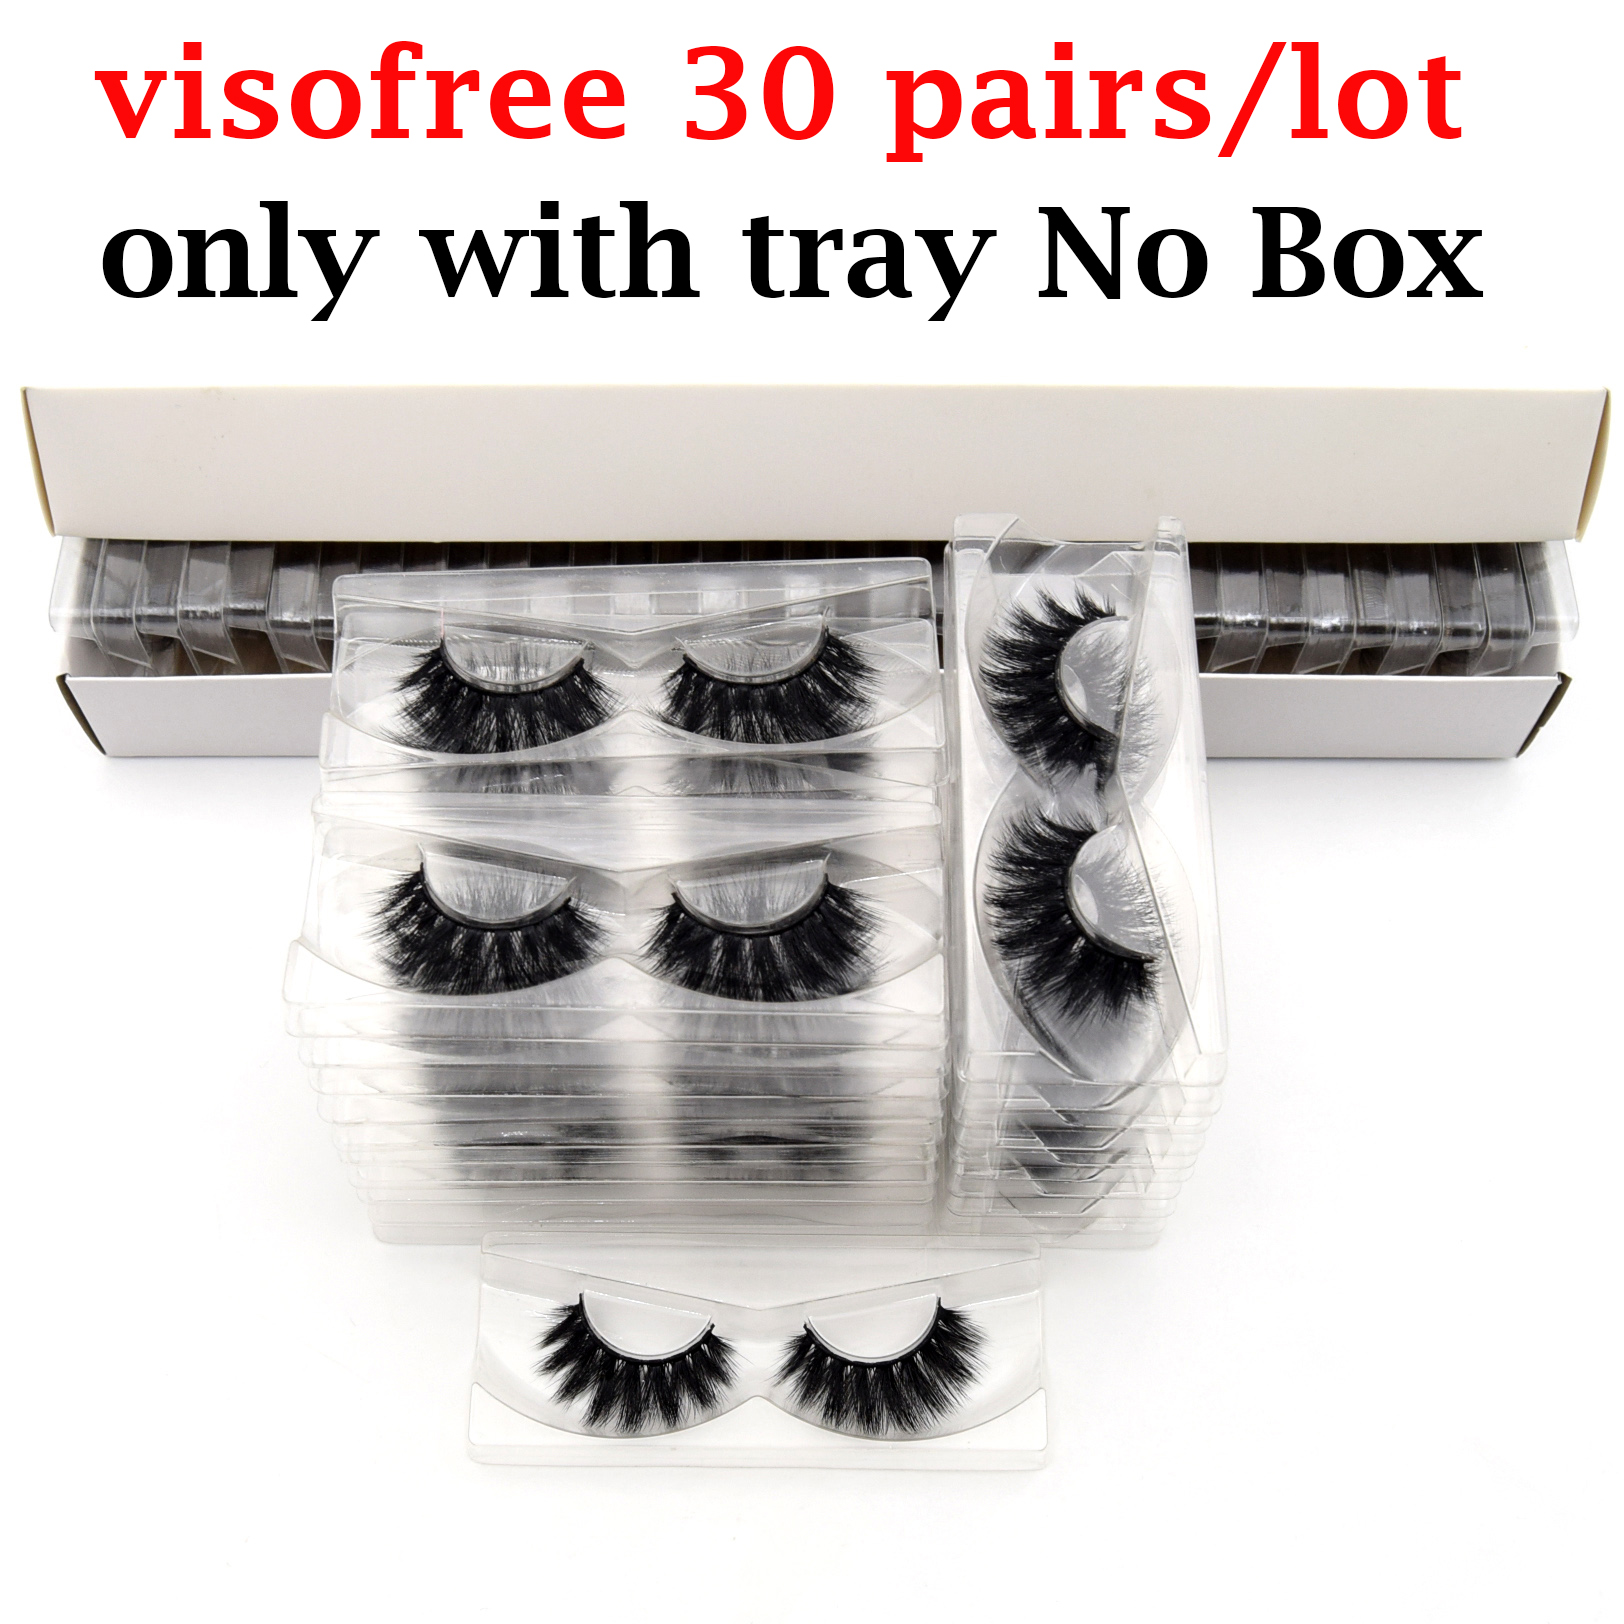 30 Pair Visofree 3D Mink Lashes No Box Natural False Eyelashes Dramatic Fake Mink Lashes Makeup Eyelash Extension Silk Eyelashes